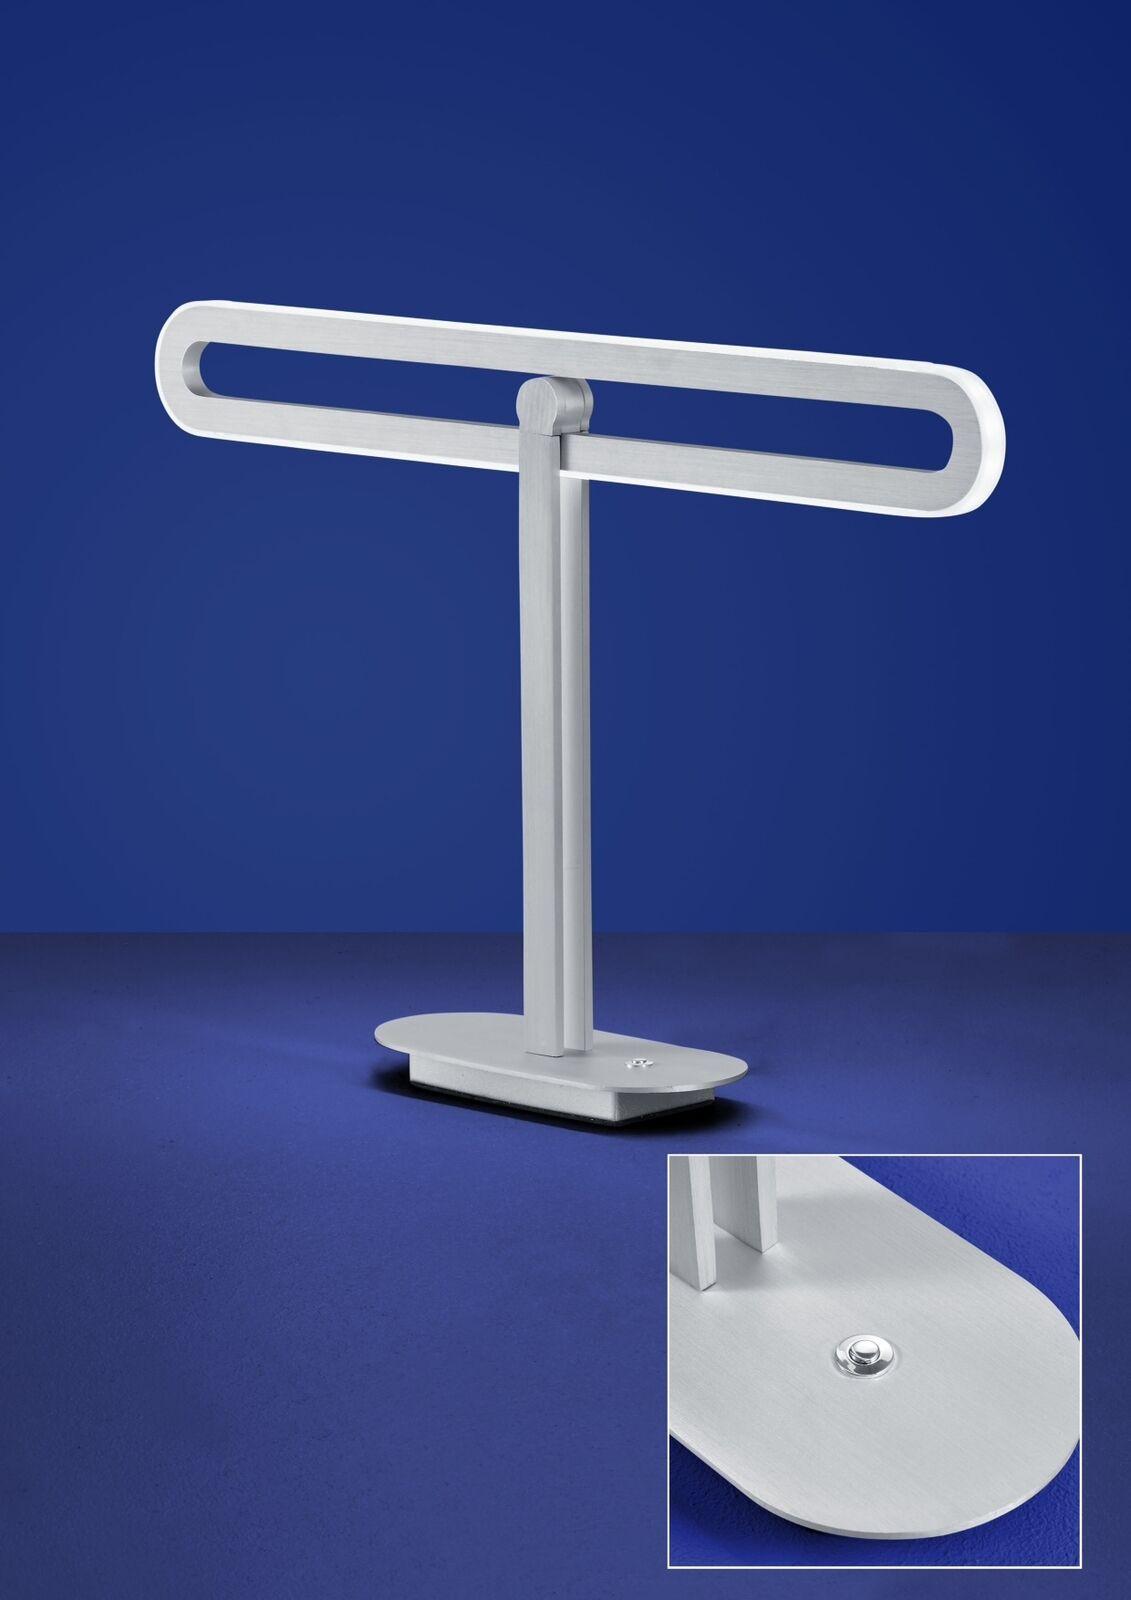 LED alemana lámpara de mesa níquel tastdimmer 1400 lúmenes altura 33cm